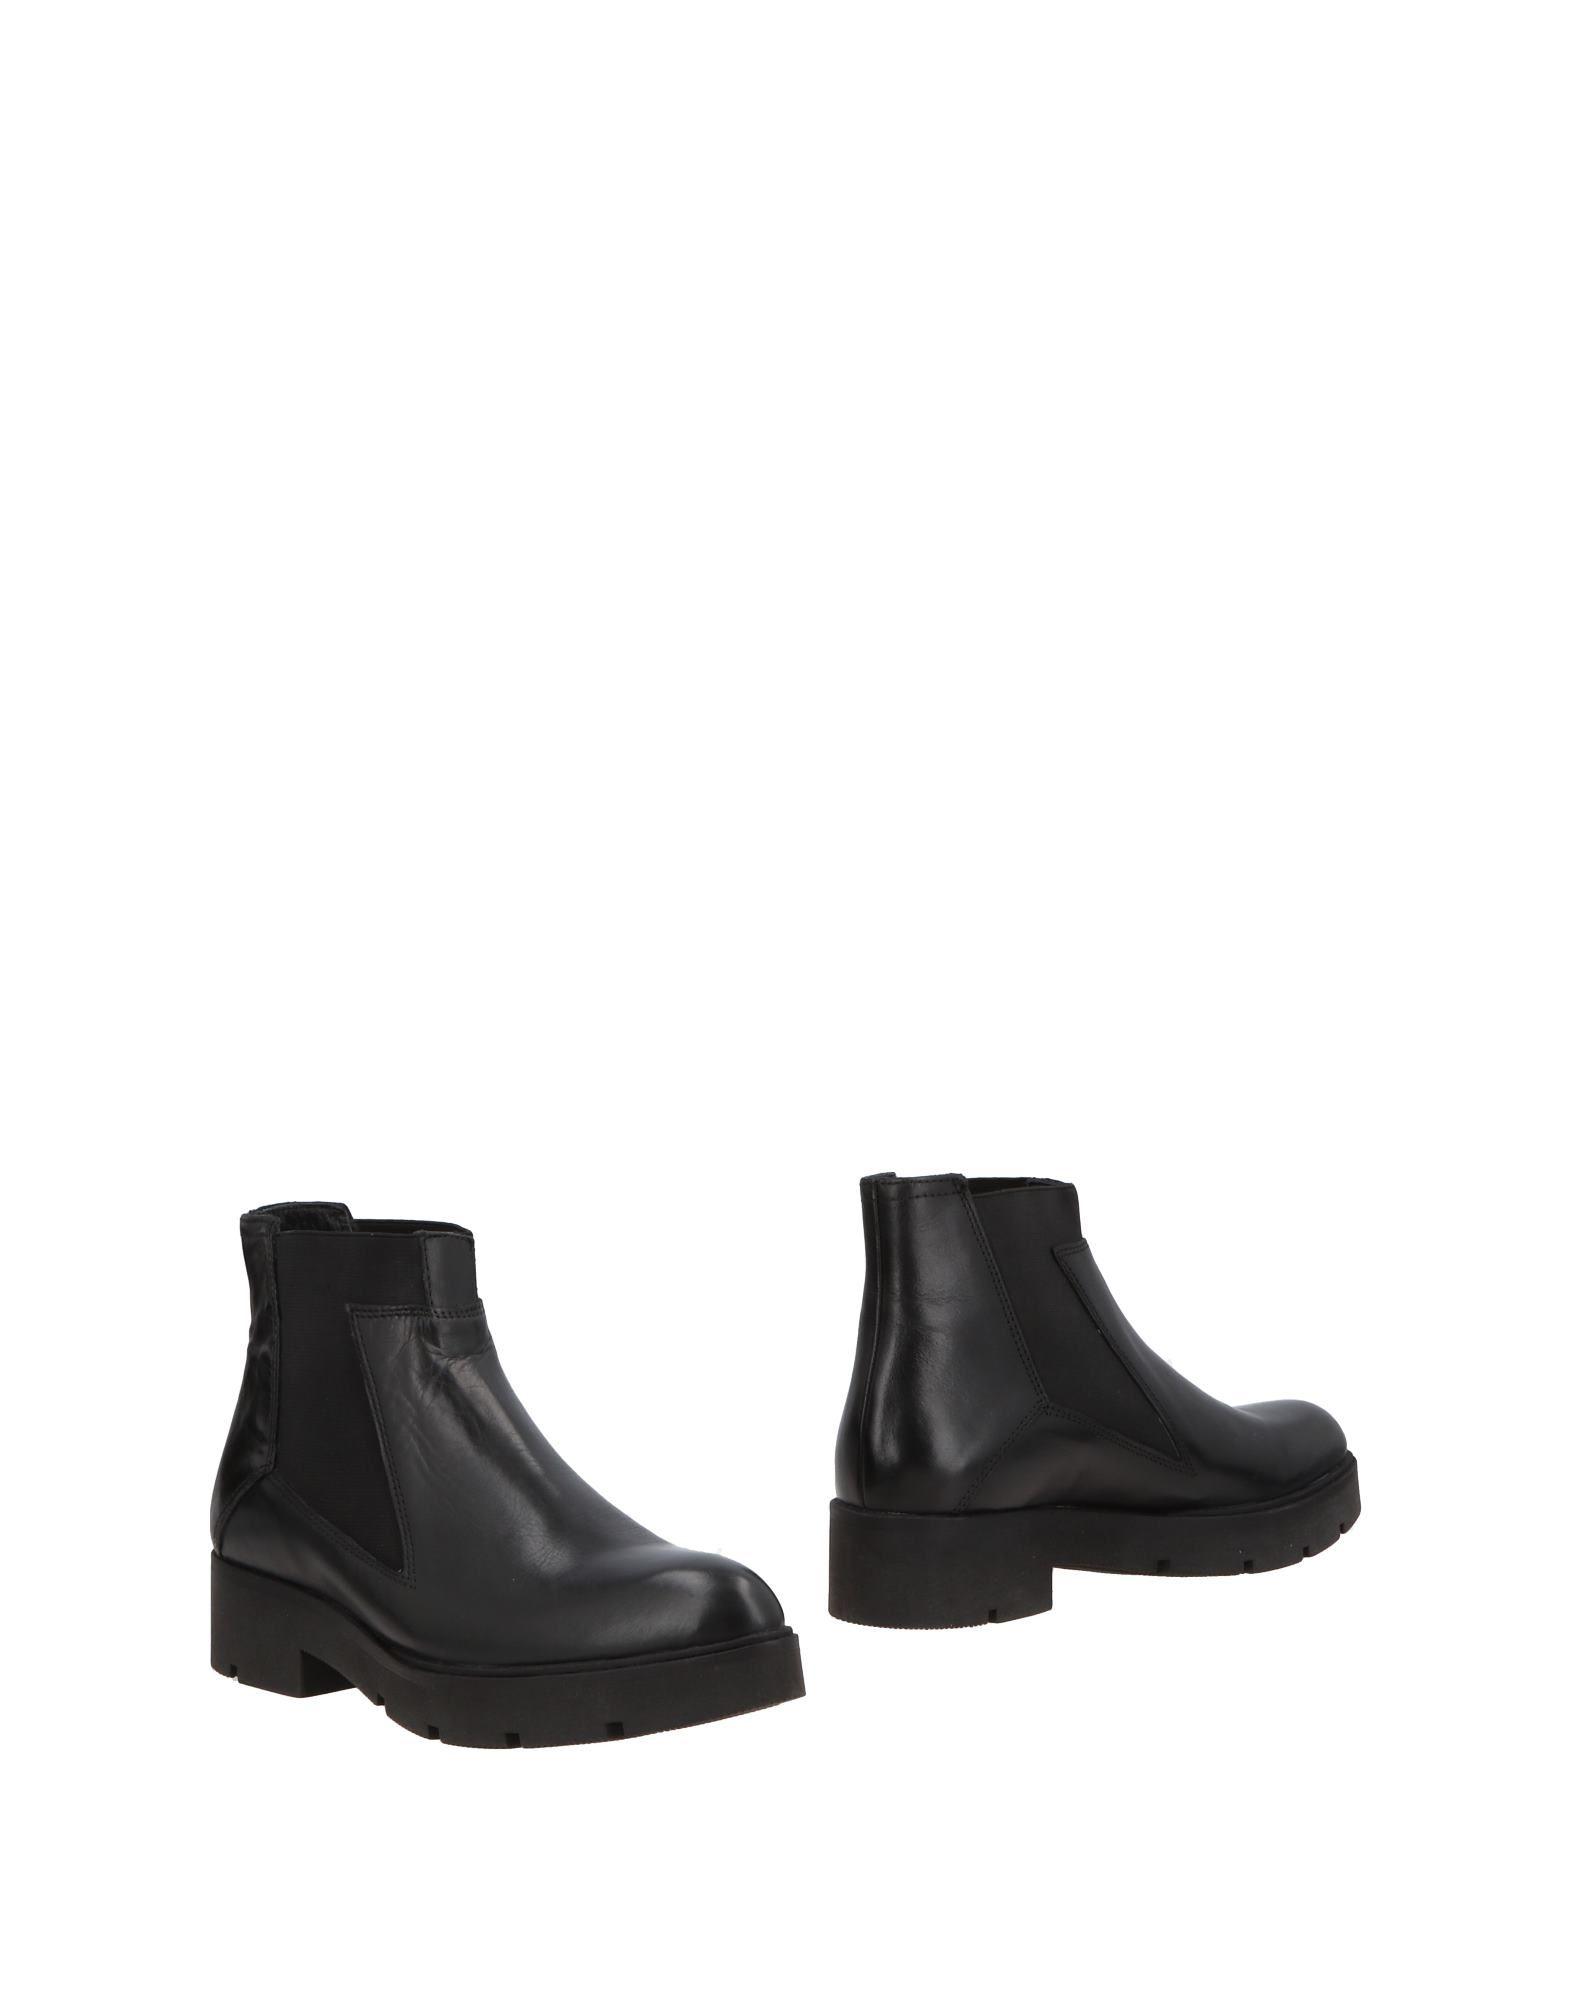 Bruno Premi Stiefelette Damen  11500371BI Gute Qualität beliebte Schuhe